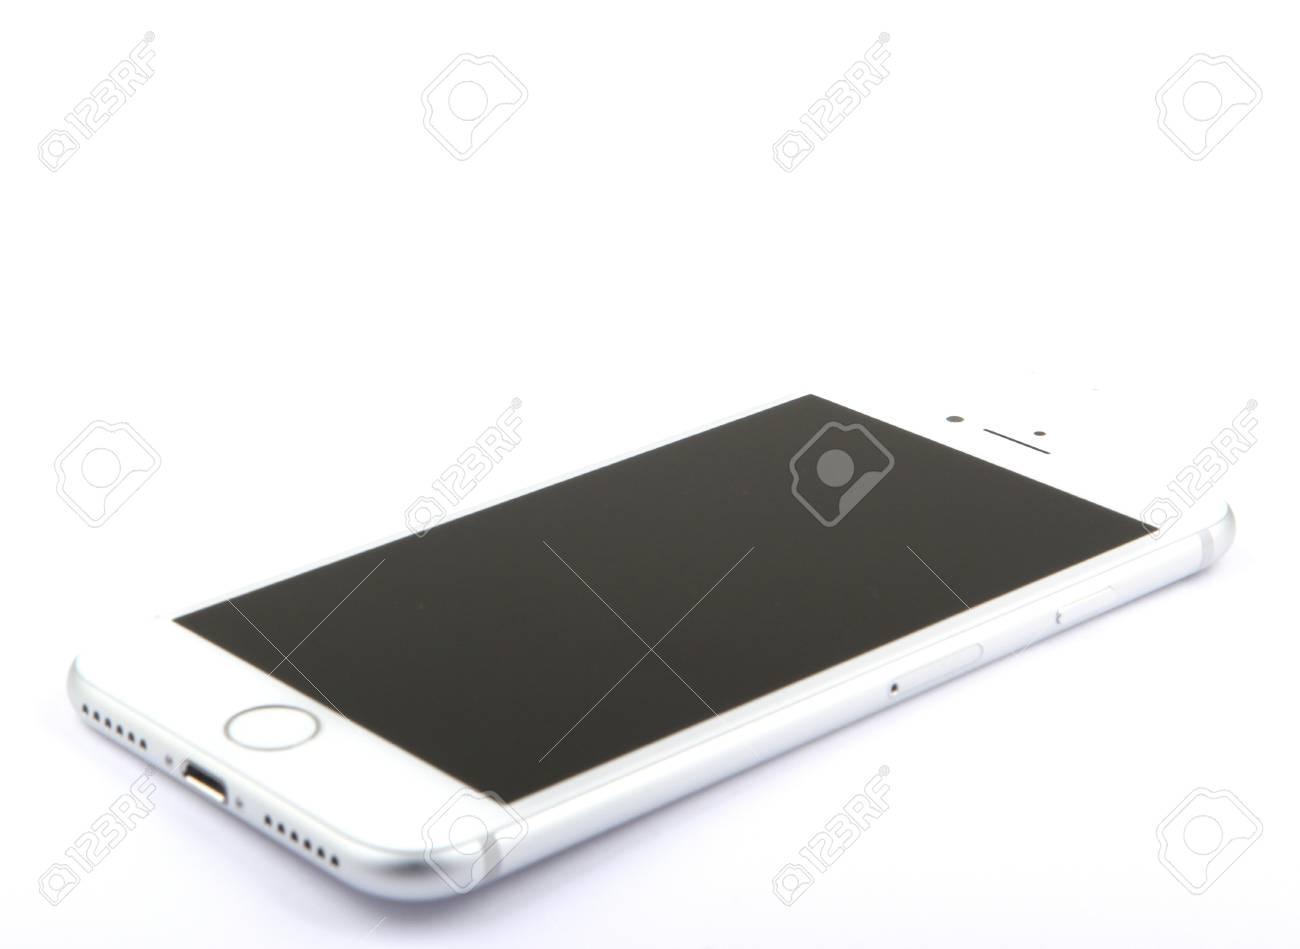 Immagini Stock Aytos Bulgaria 26 Ottobre 2016 Iphone 7 Isolato